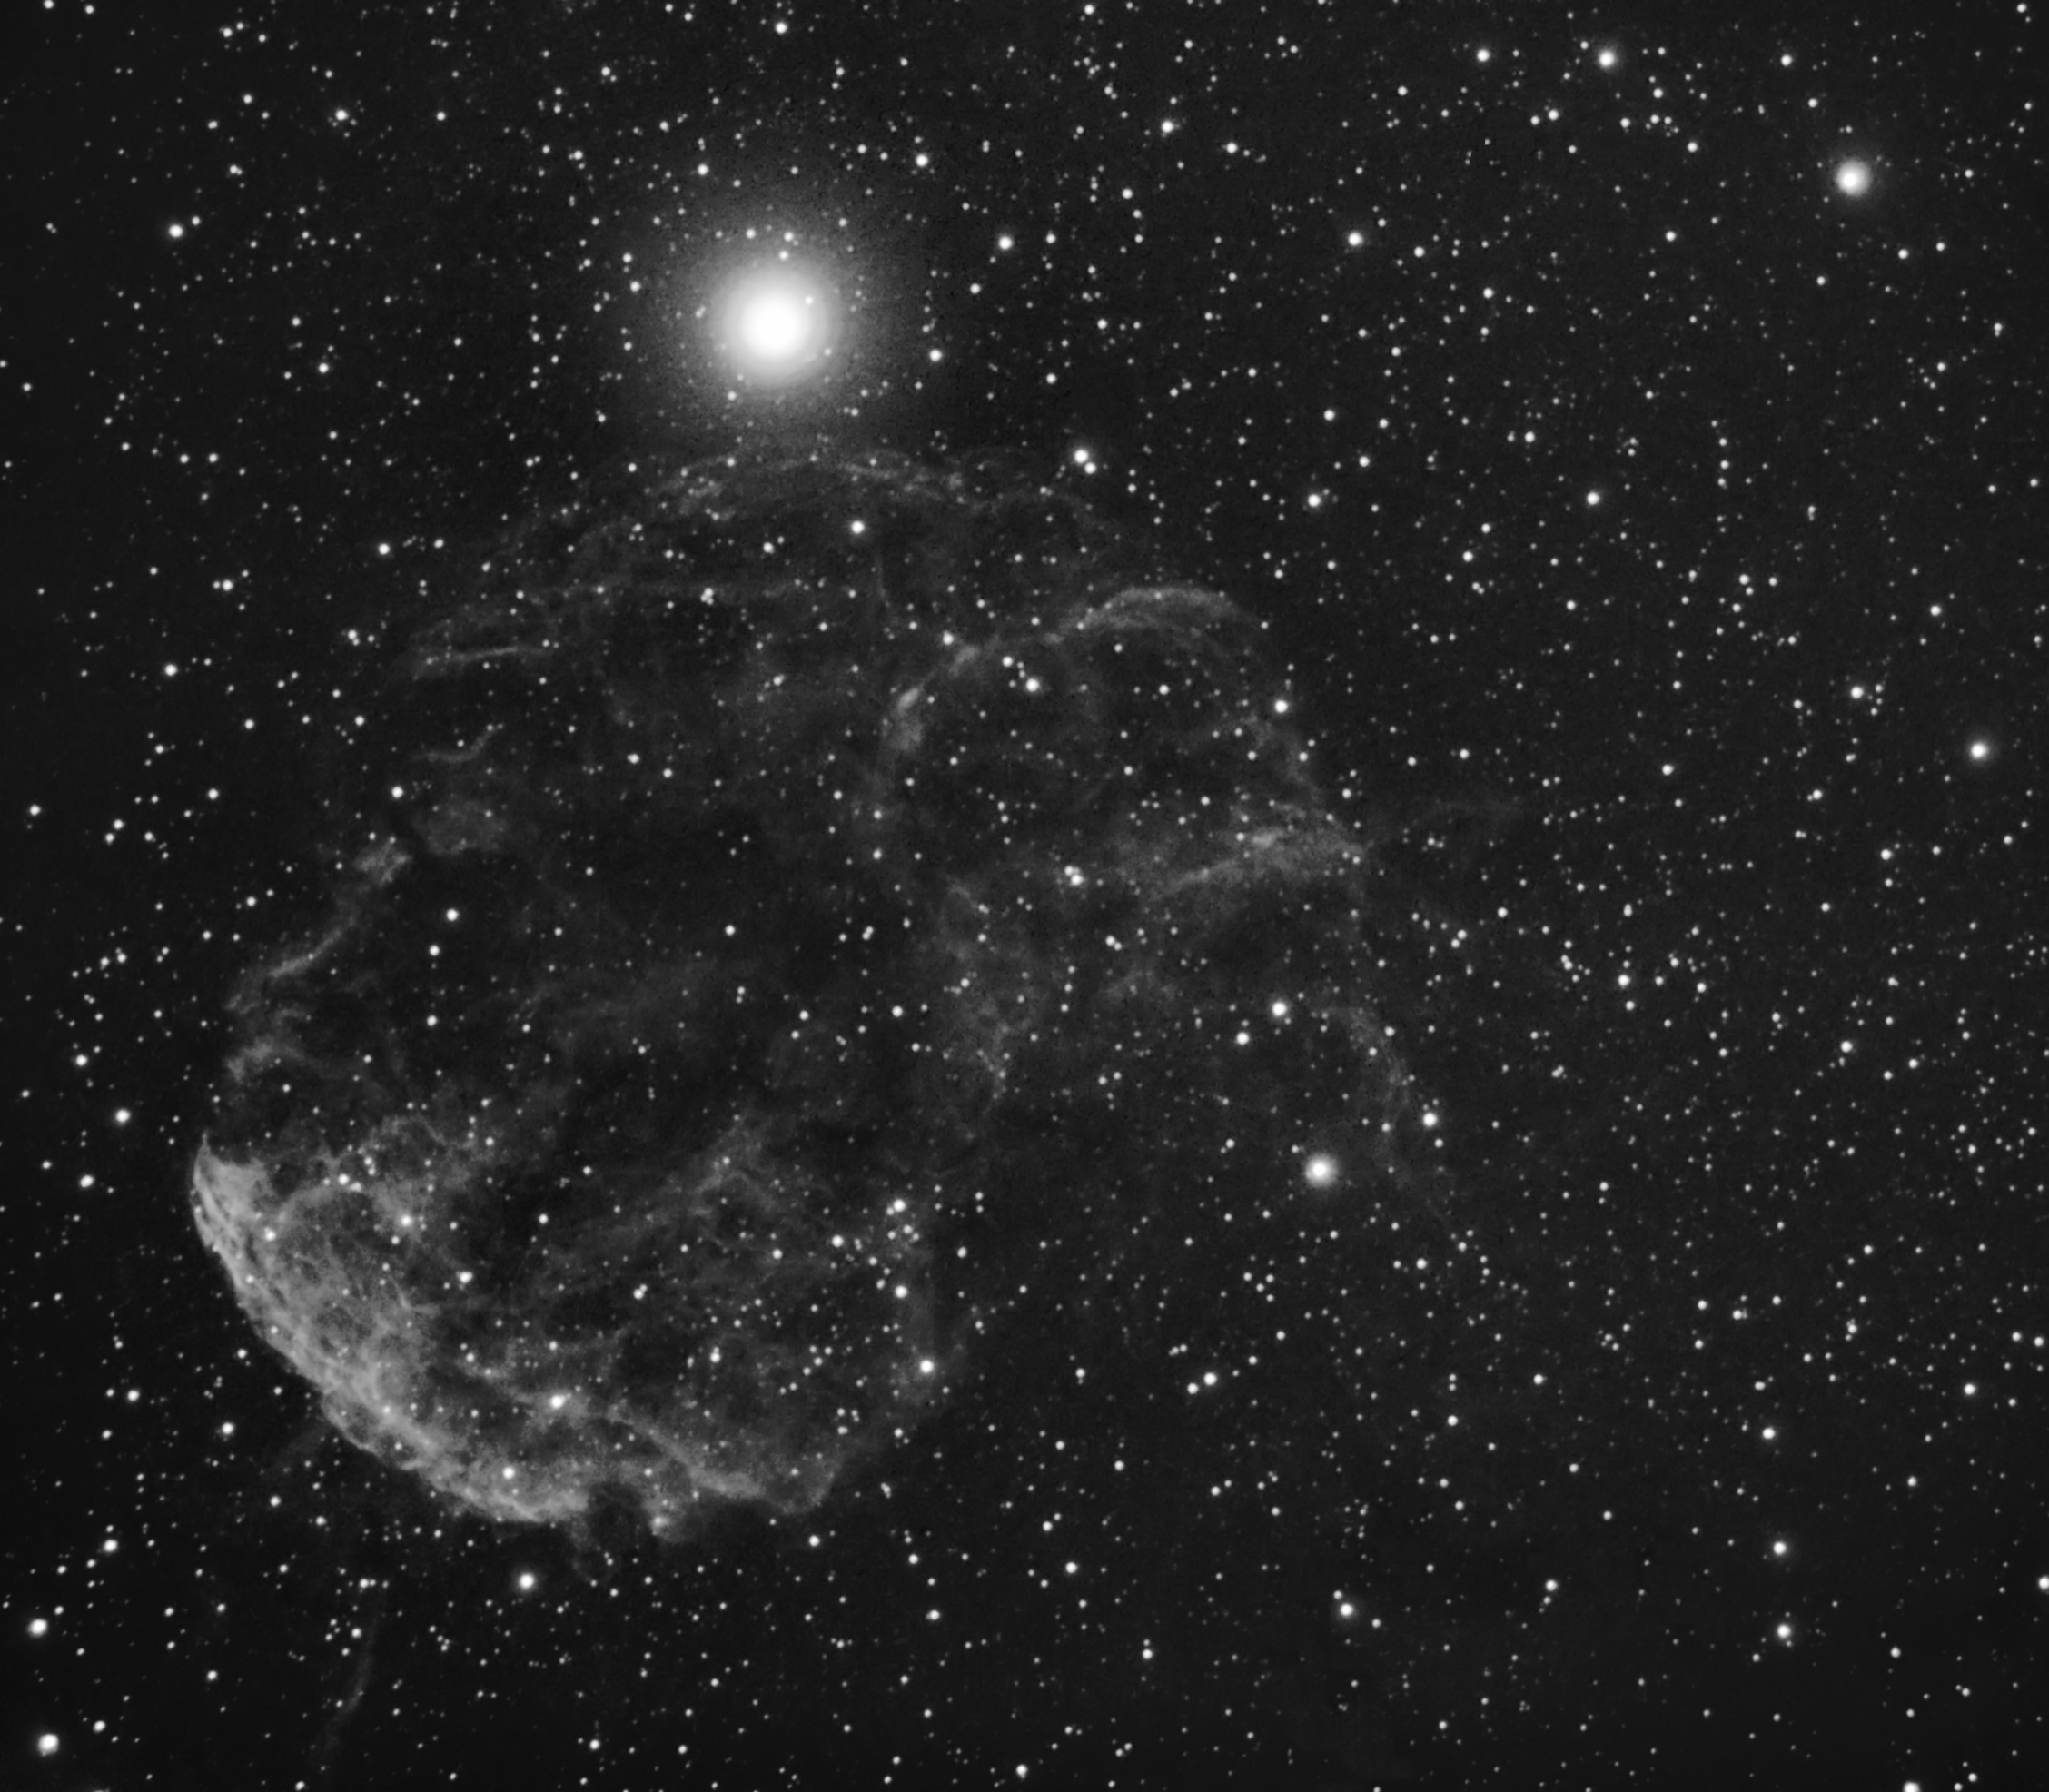 Supernova Restant IC443